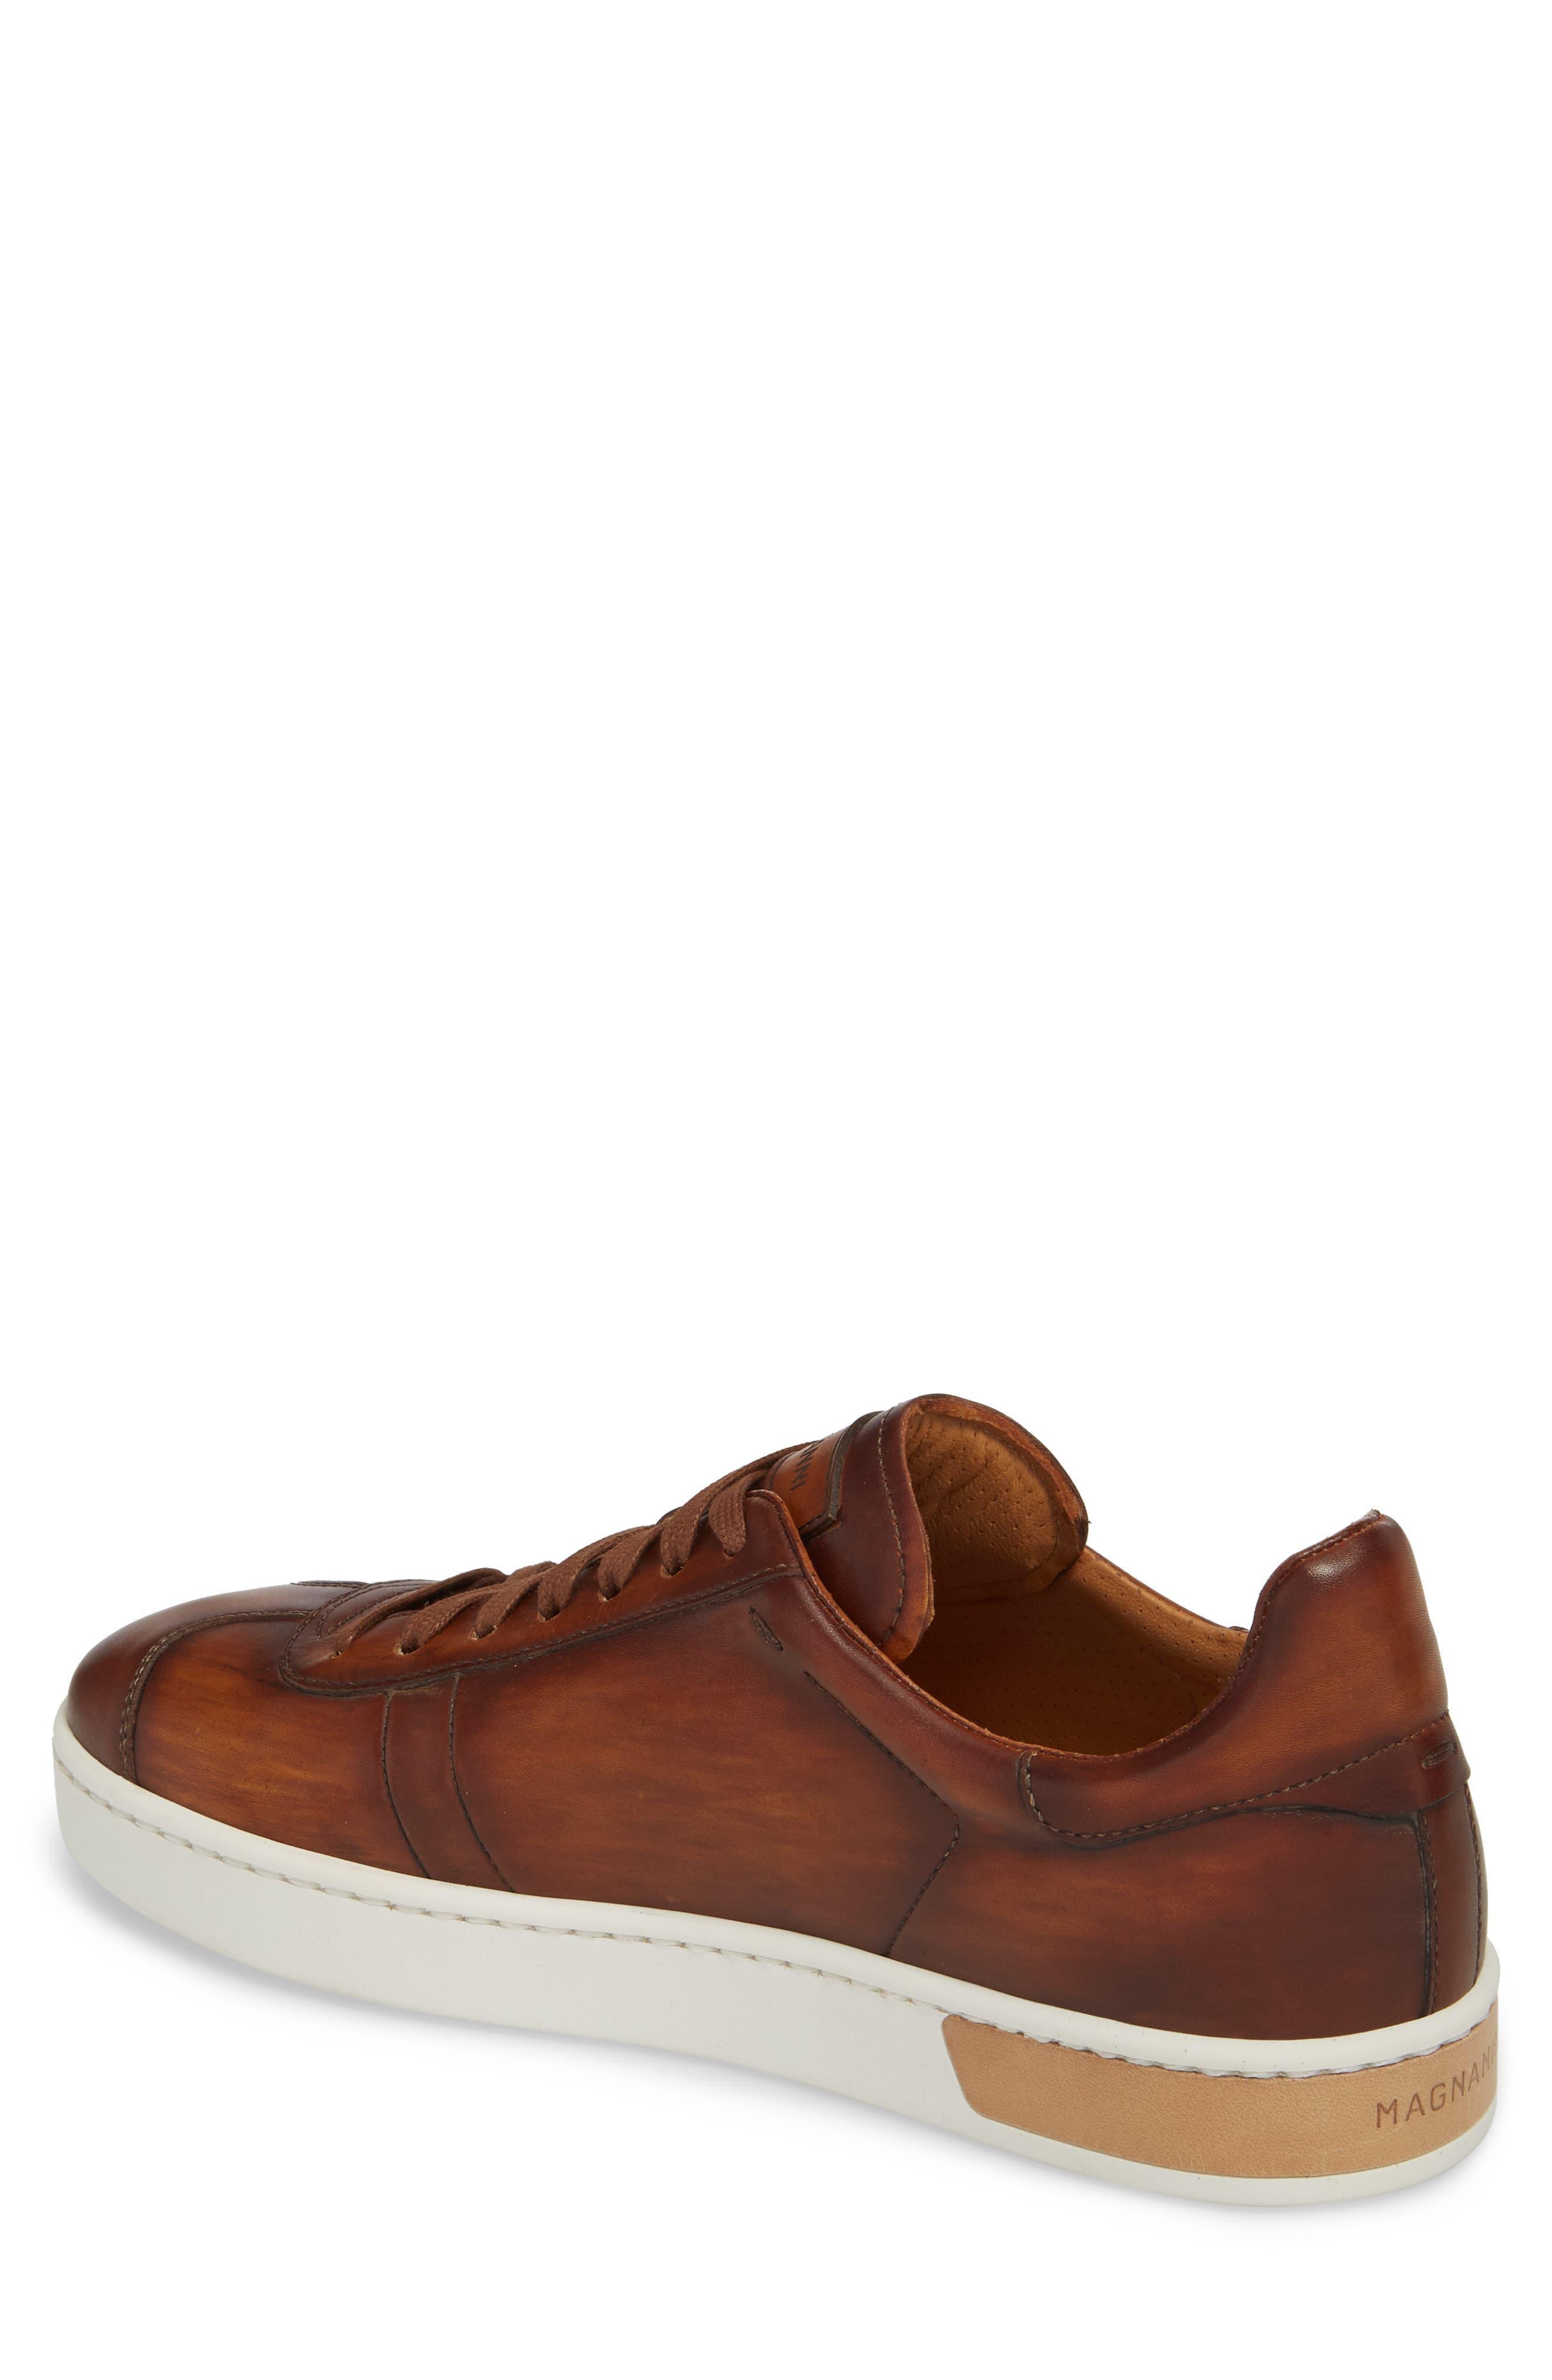 Gunner Low Top Sneaker,                             Alternate thumbnail 2, color,                             Cuero Leather